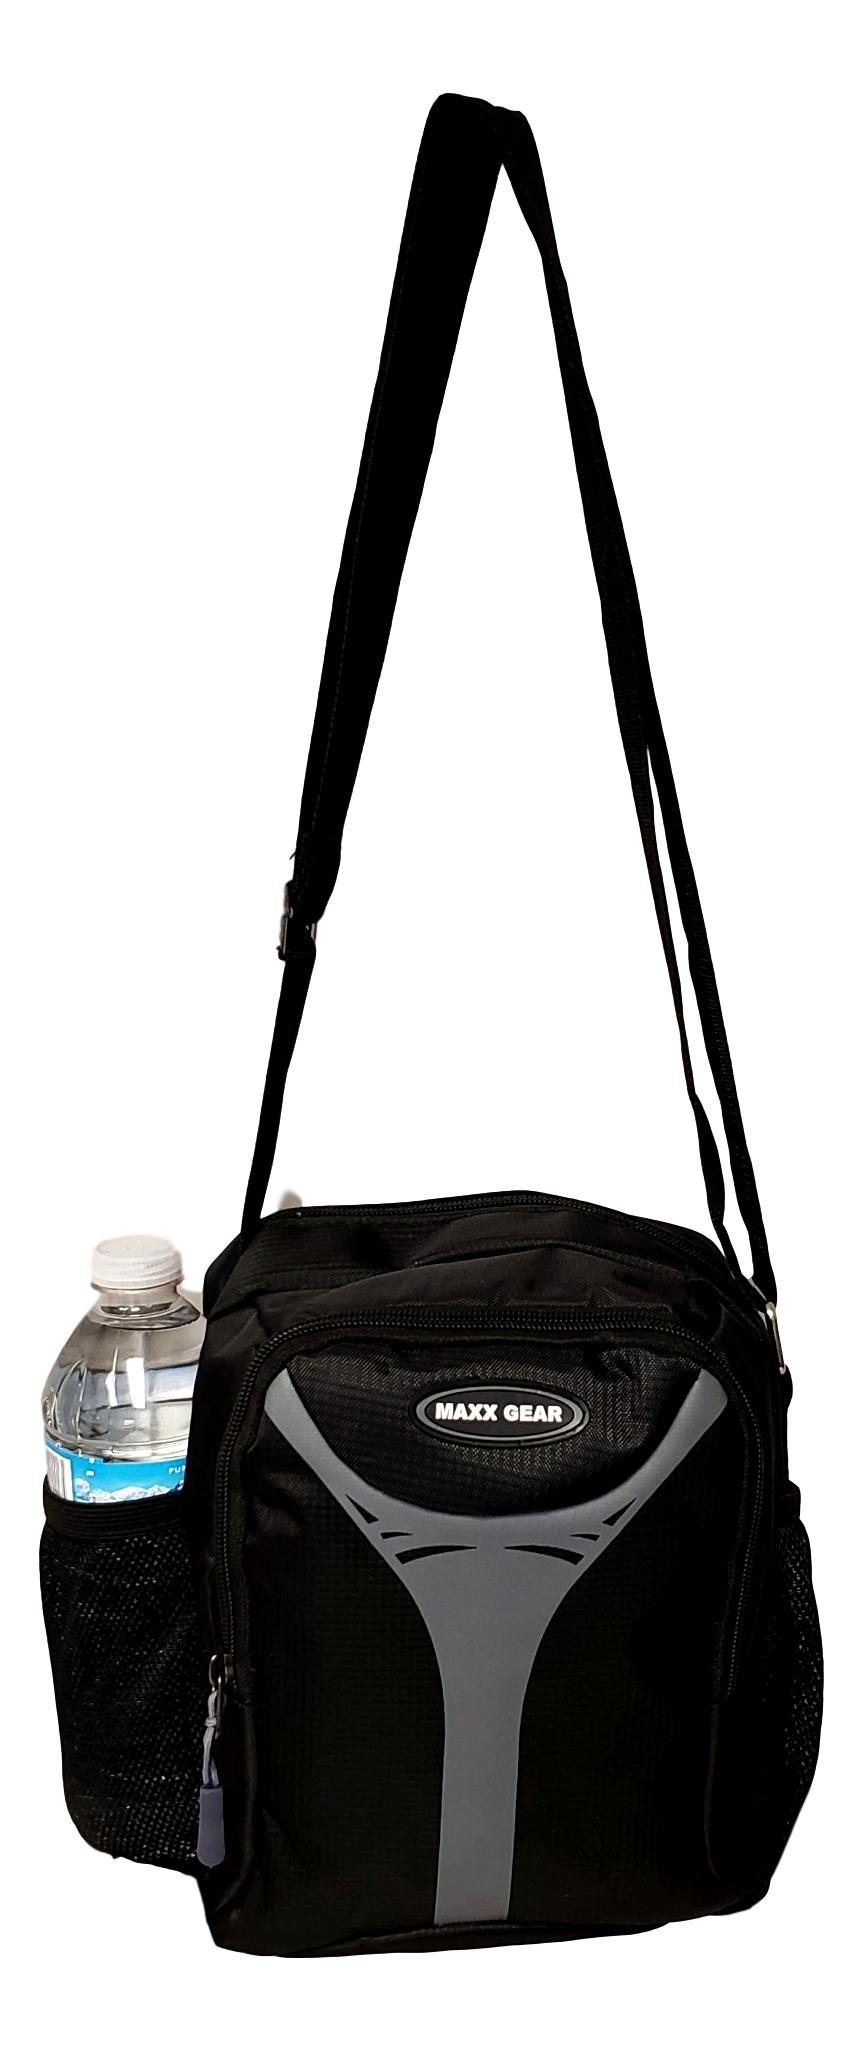 Unisex Excursion Organizer Day Pack Shoulder Bag (Black - Gray)